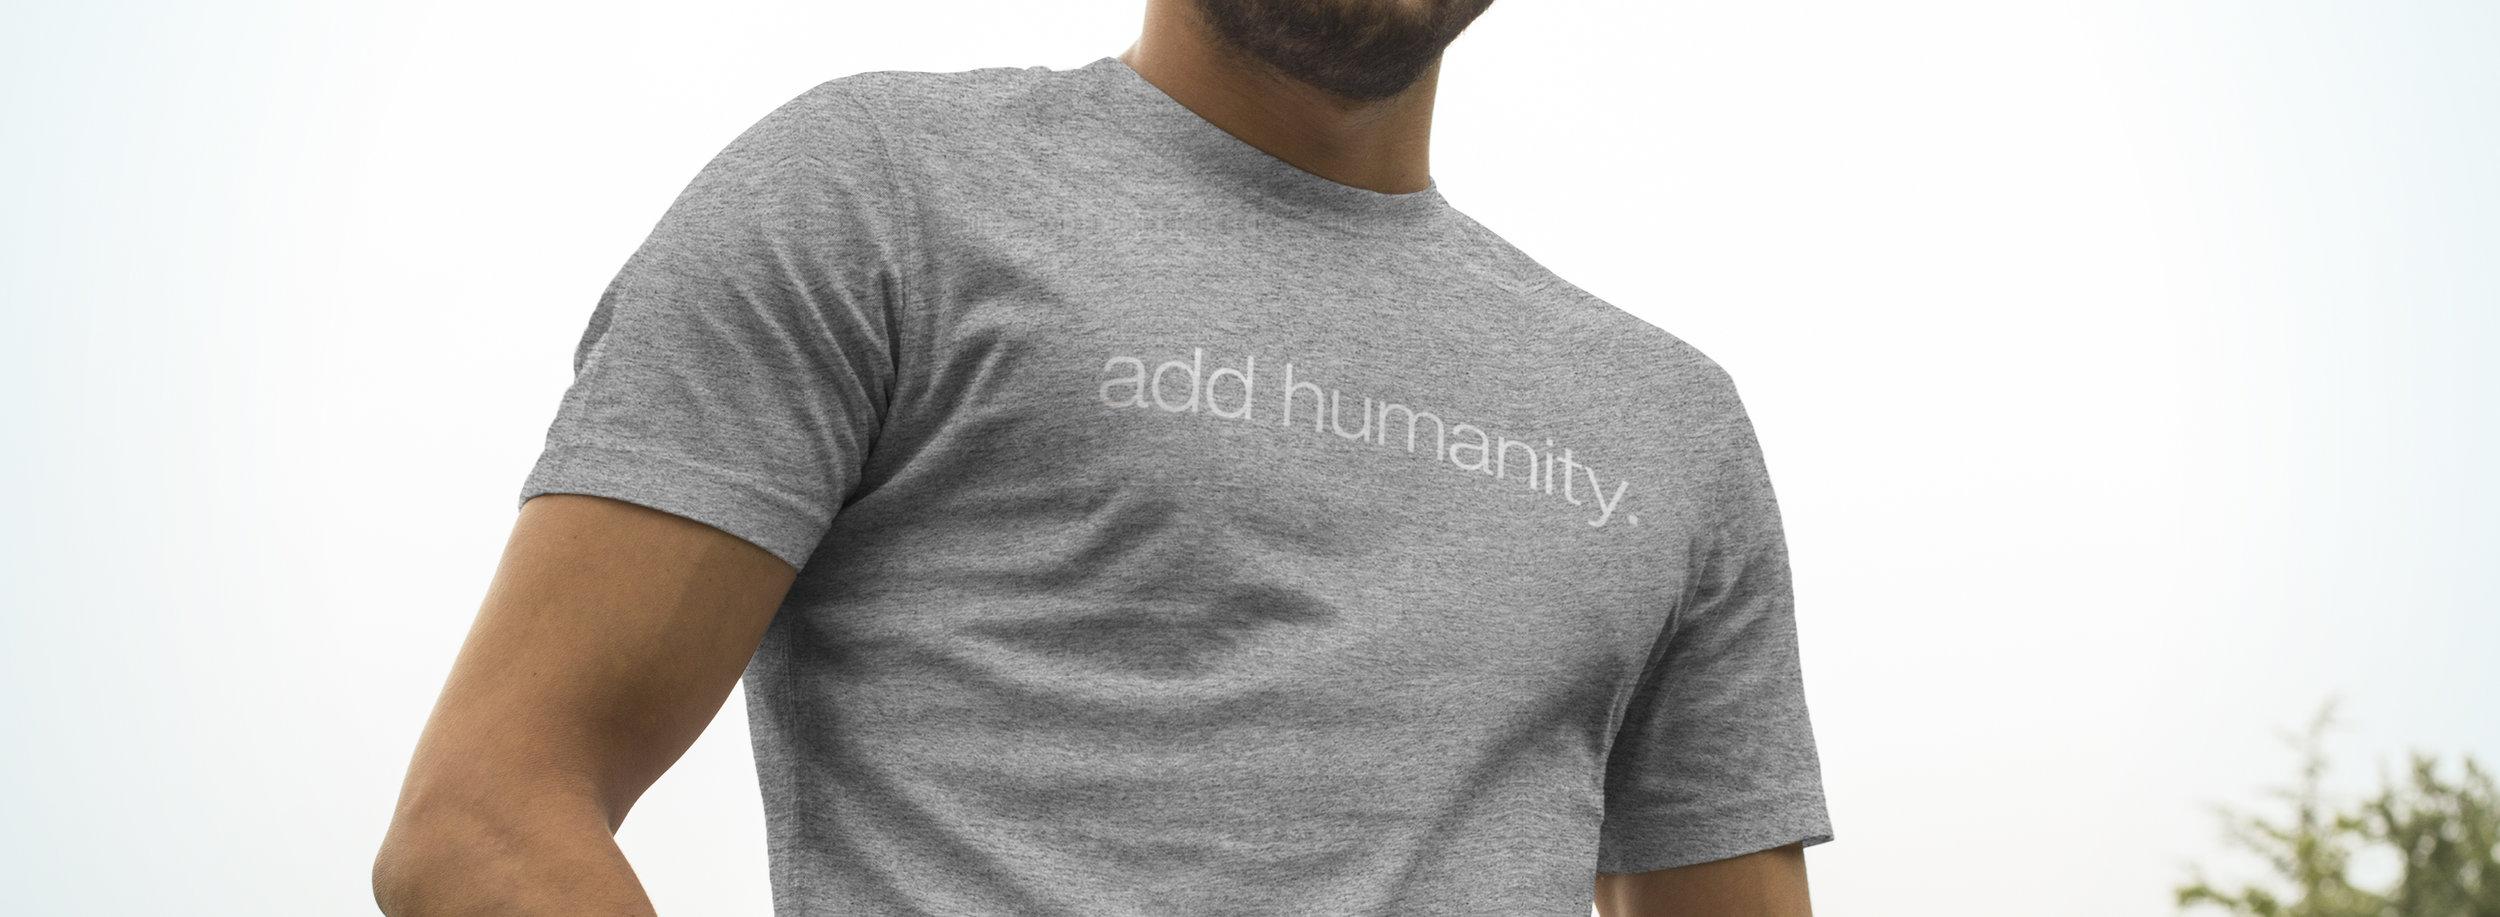 V02 AFH 2018 Add Humanity T-Shirt 2.jpg